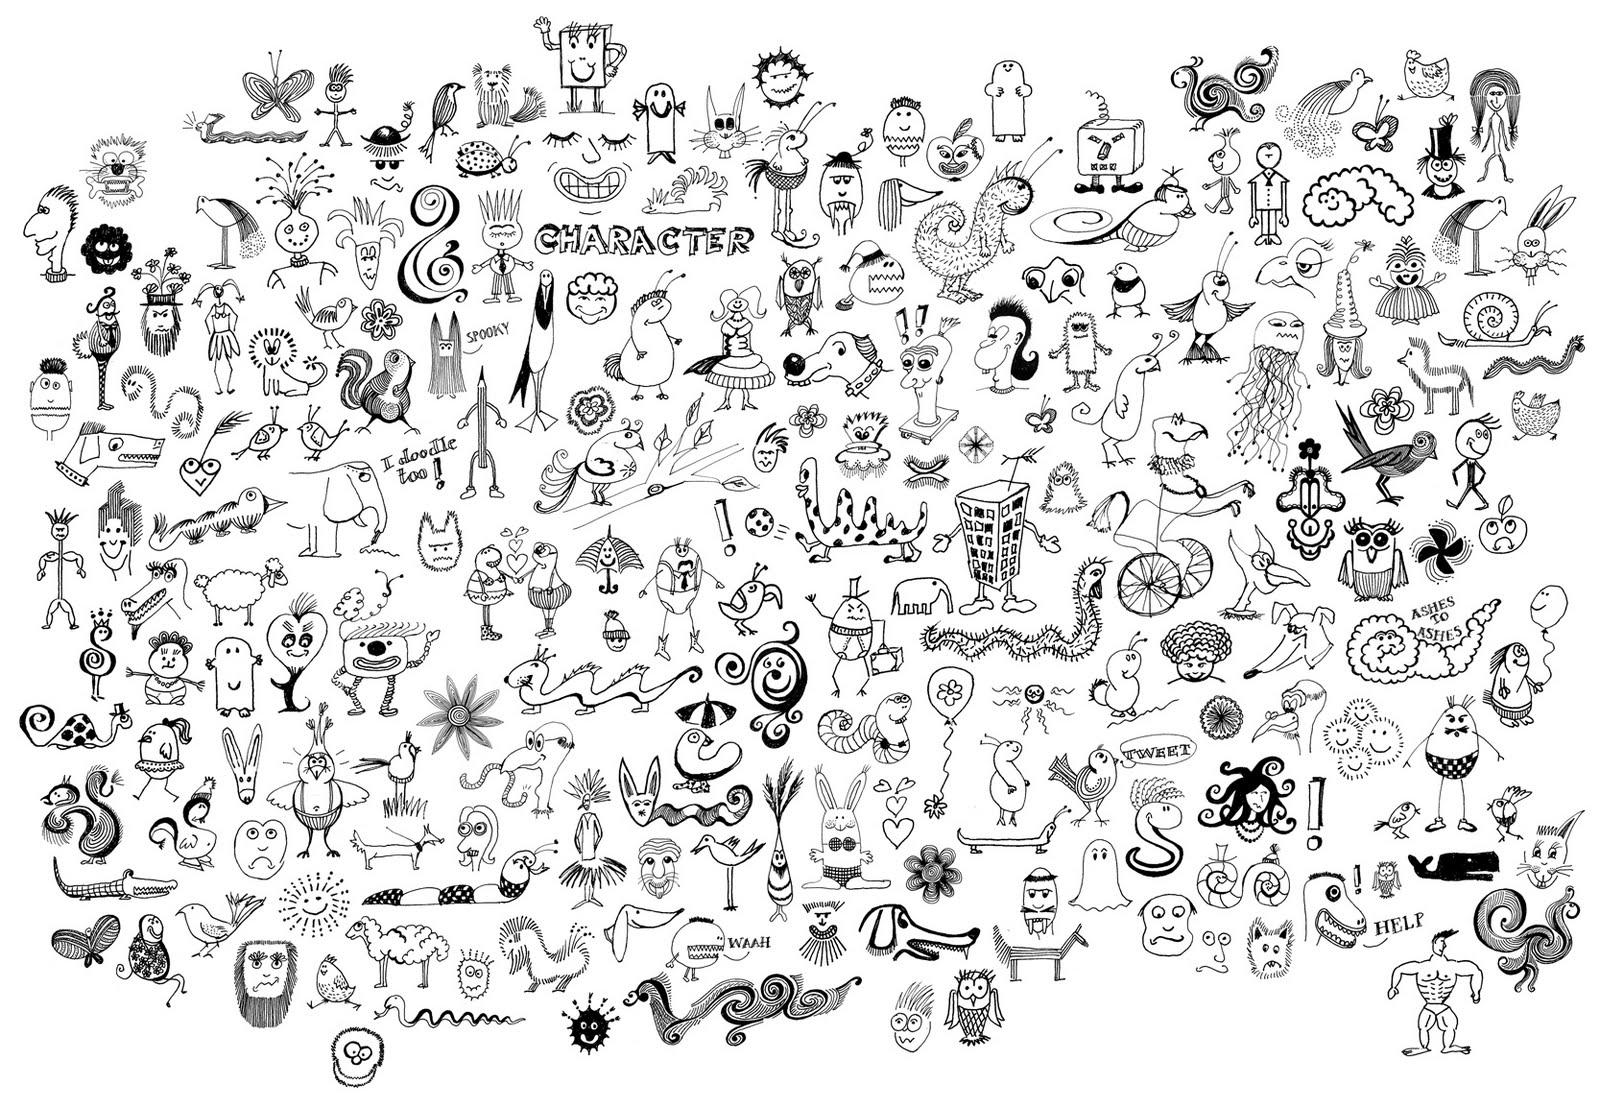 Doodle S: Groovy Doodling On Pinterest